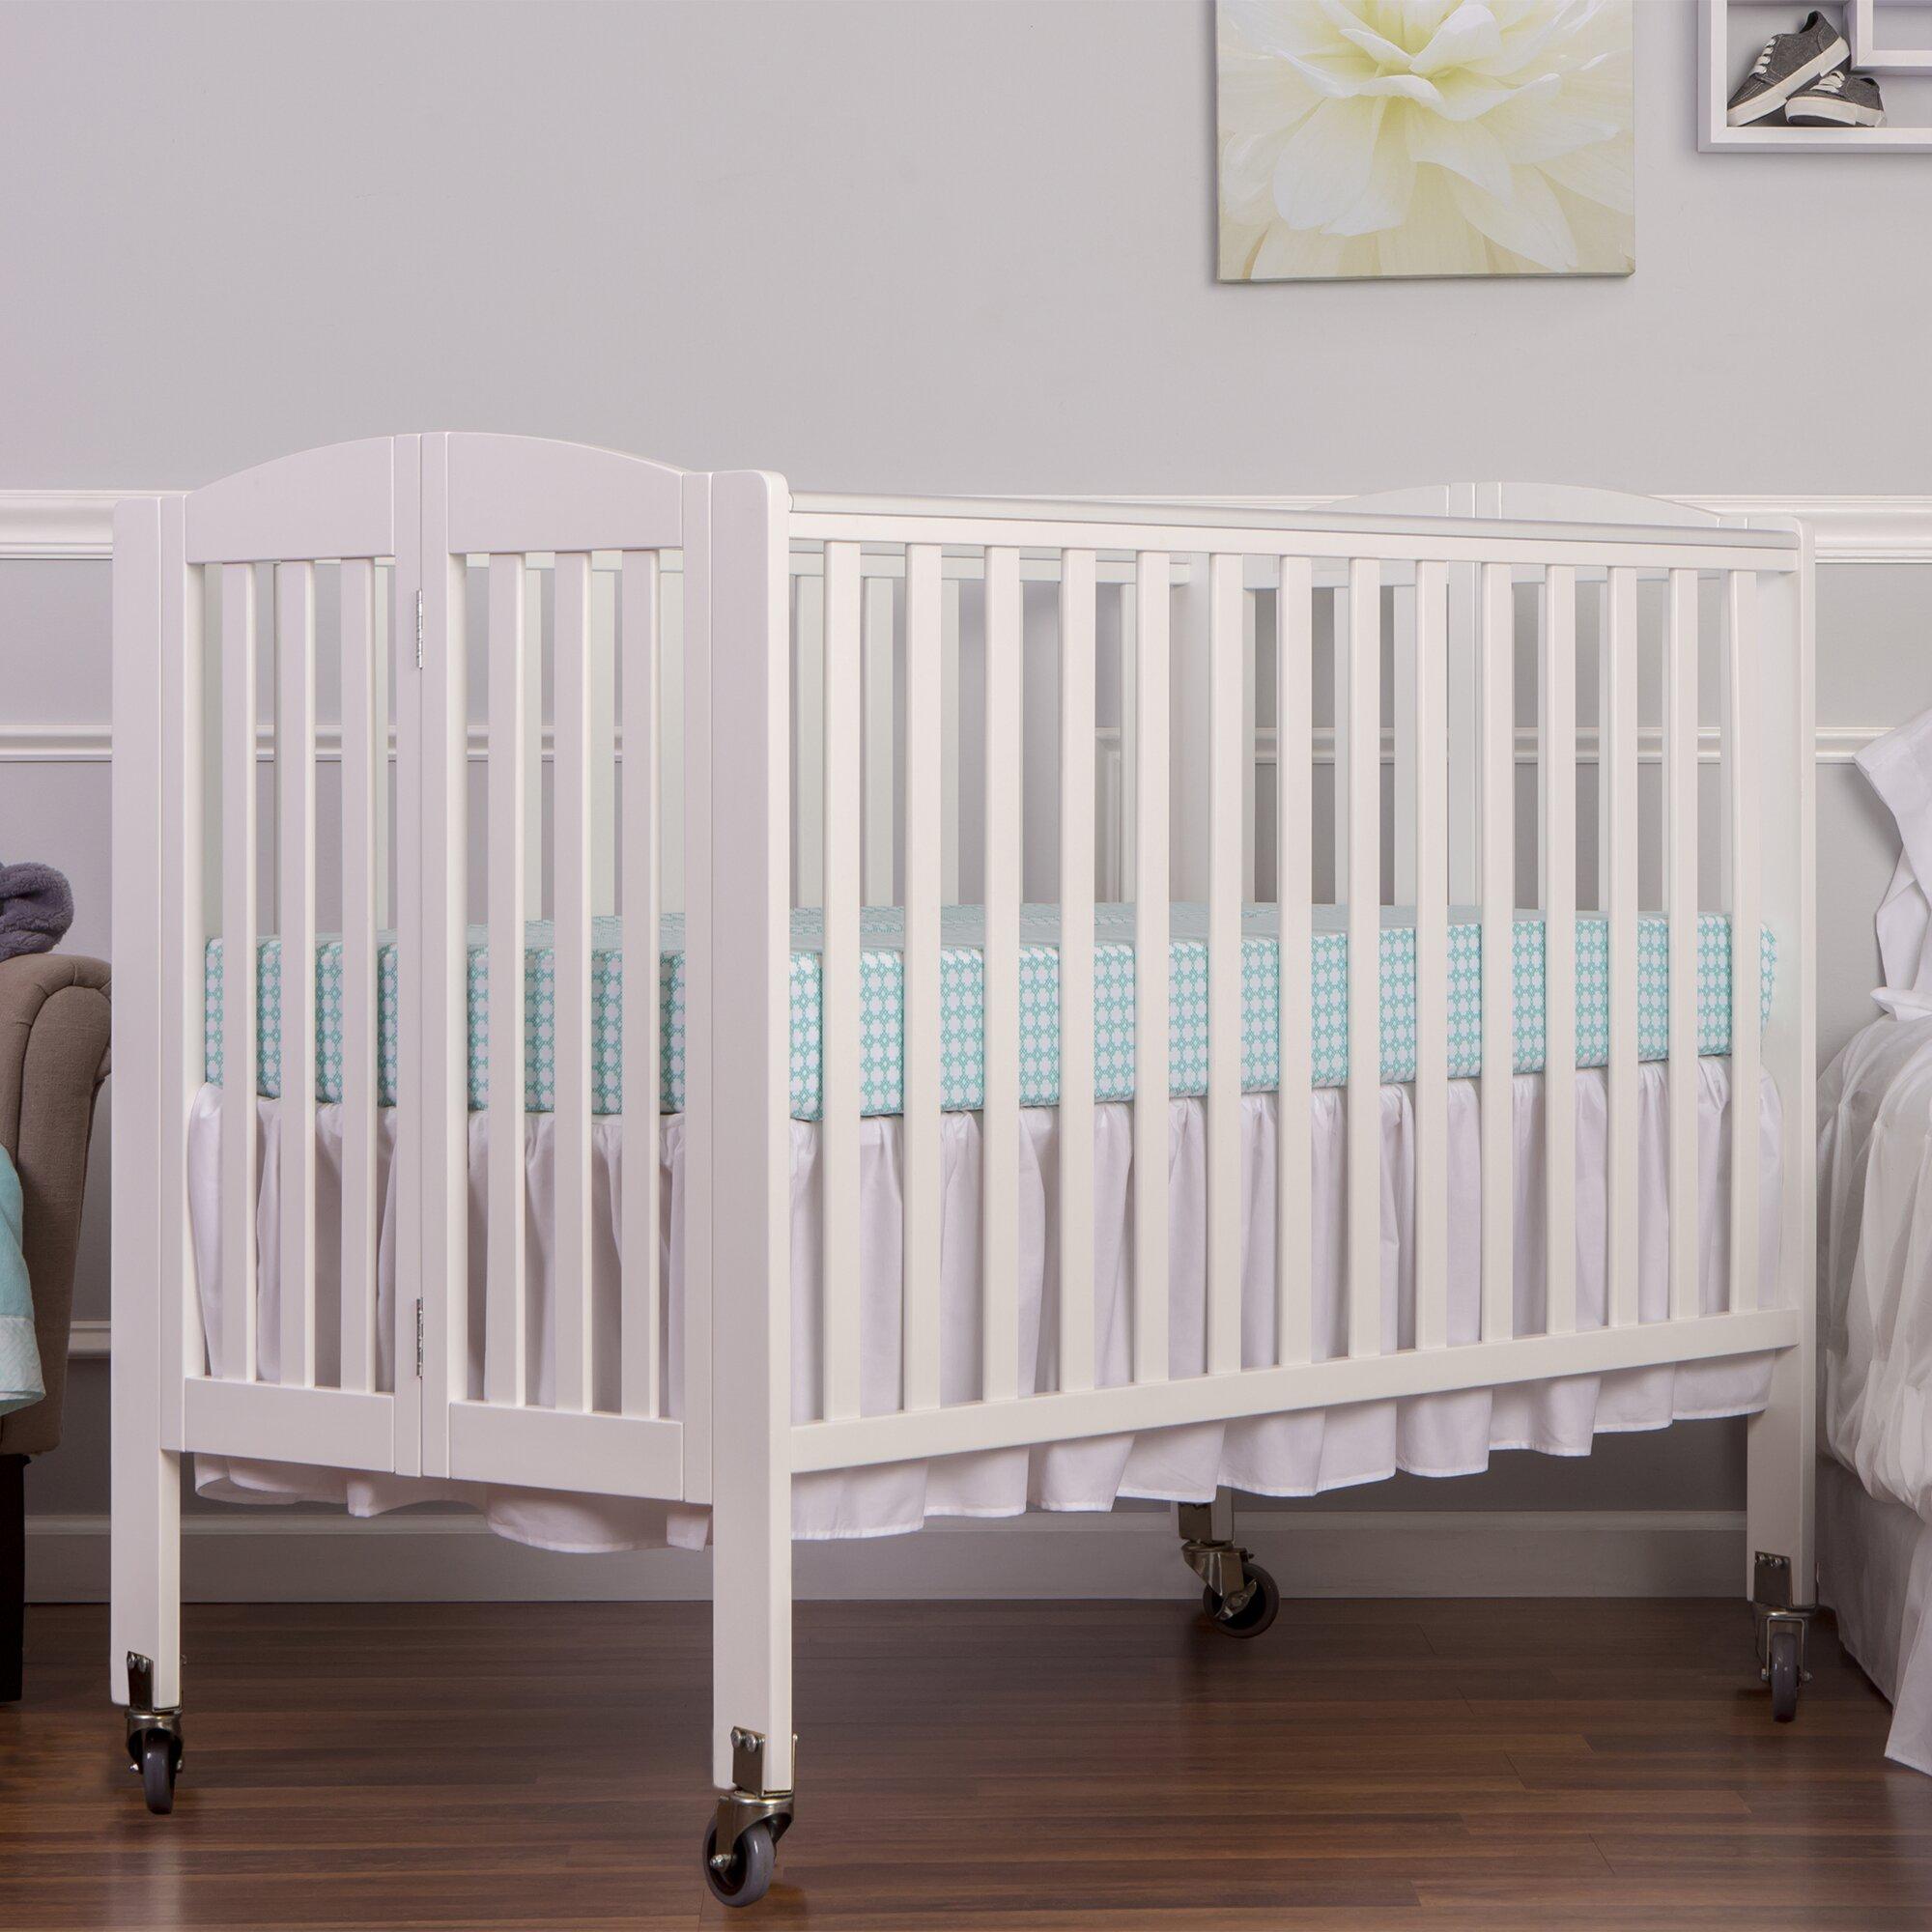 Emma iron crib for sale - Folding Crib